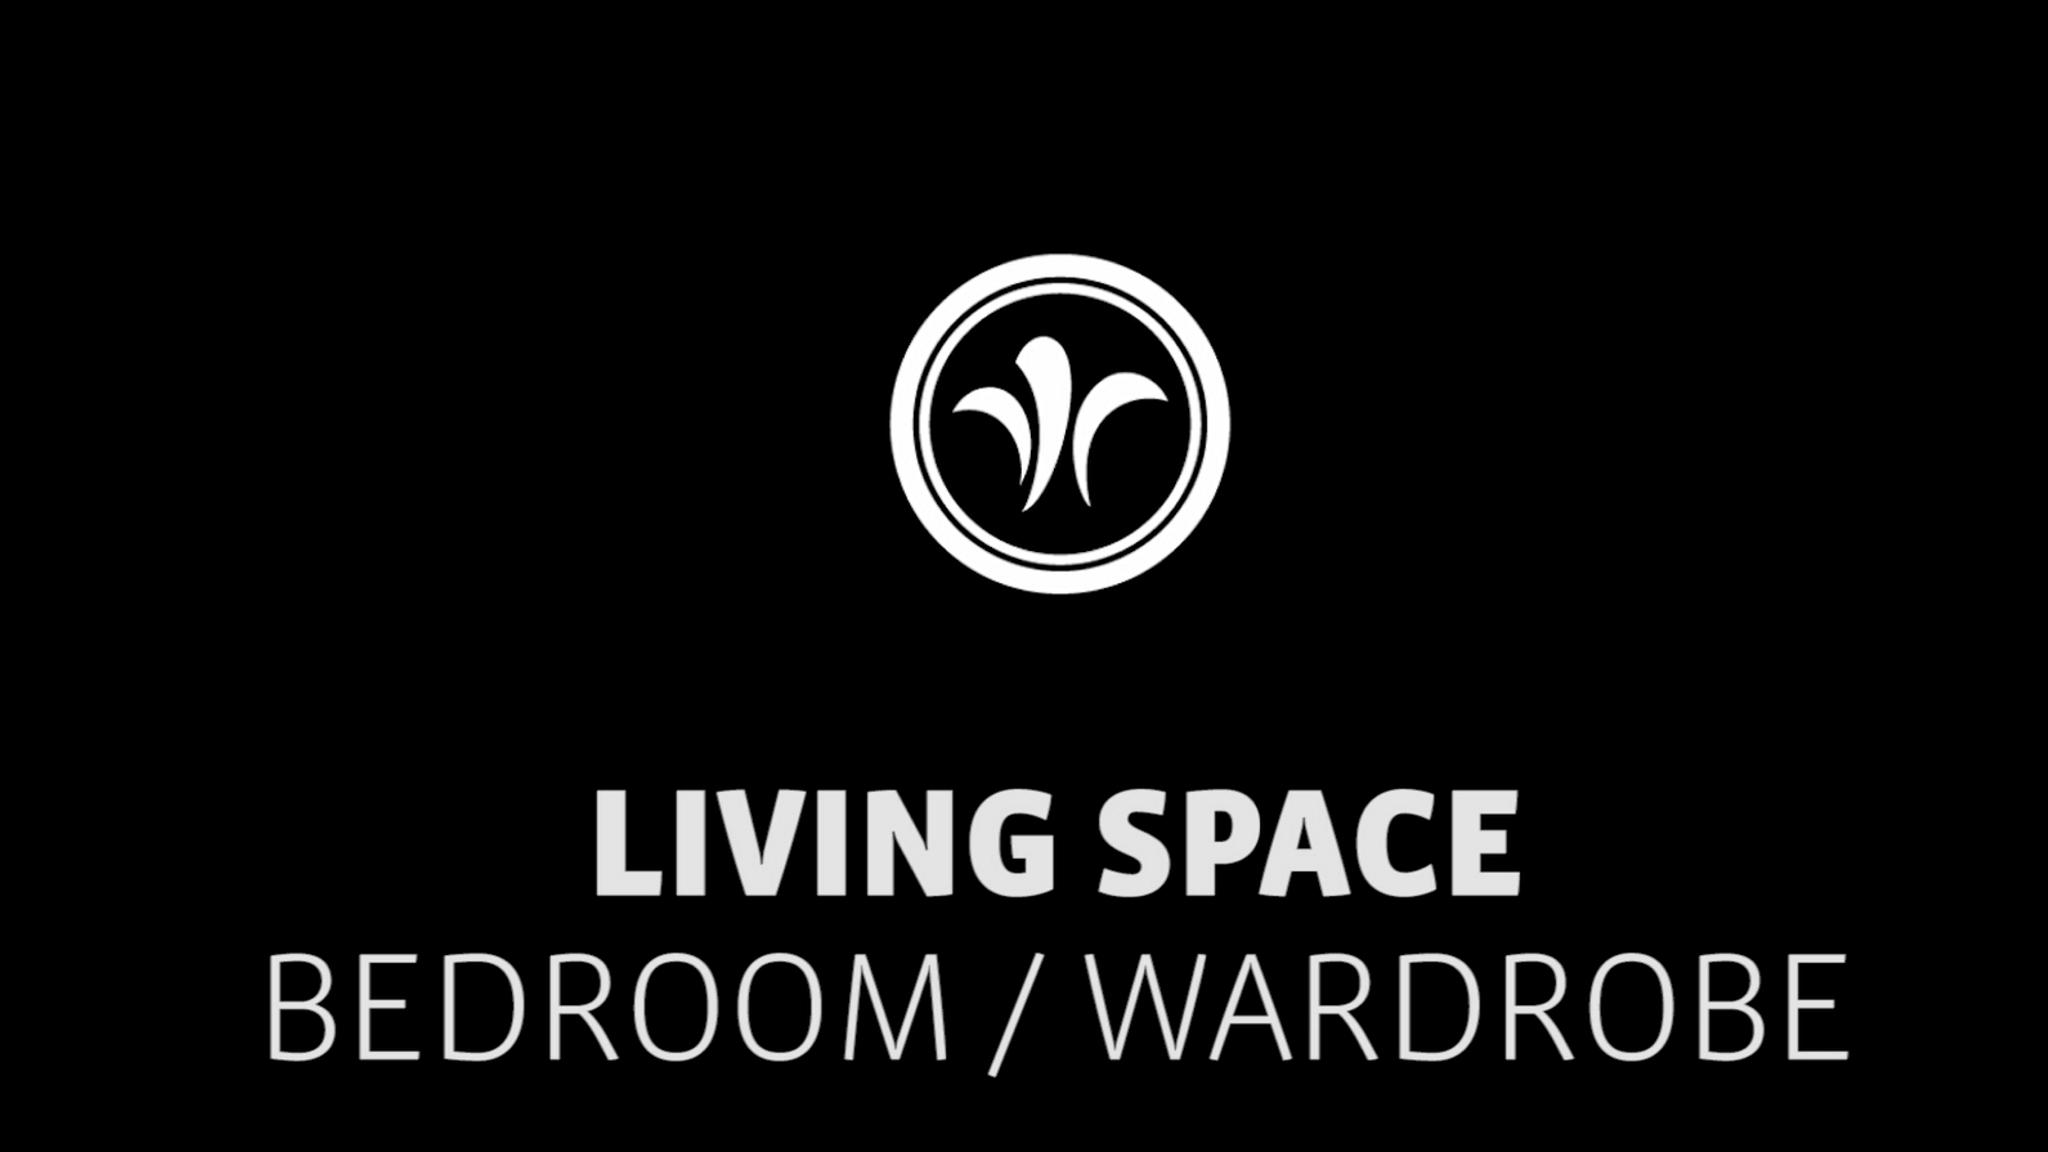 motorhome wardrobe in the bedroom // niesmann+bischoff - camper (model ARTO) // 2019 // WO3